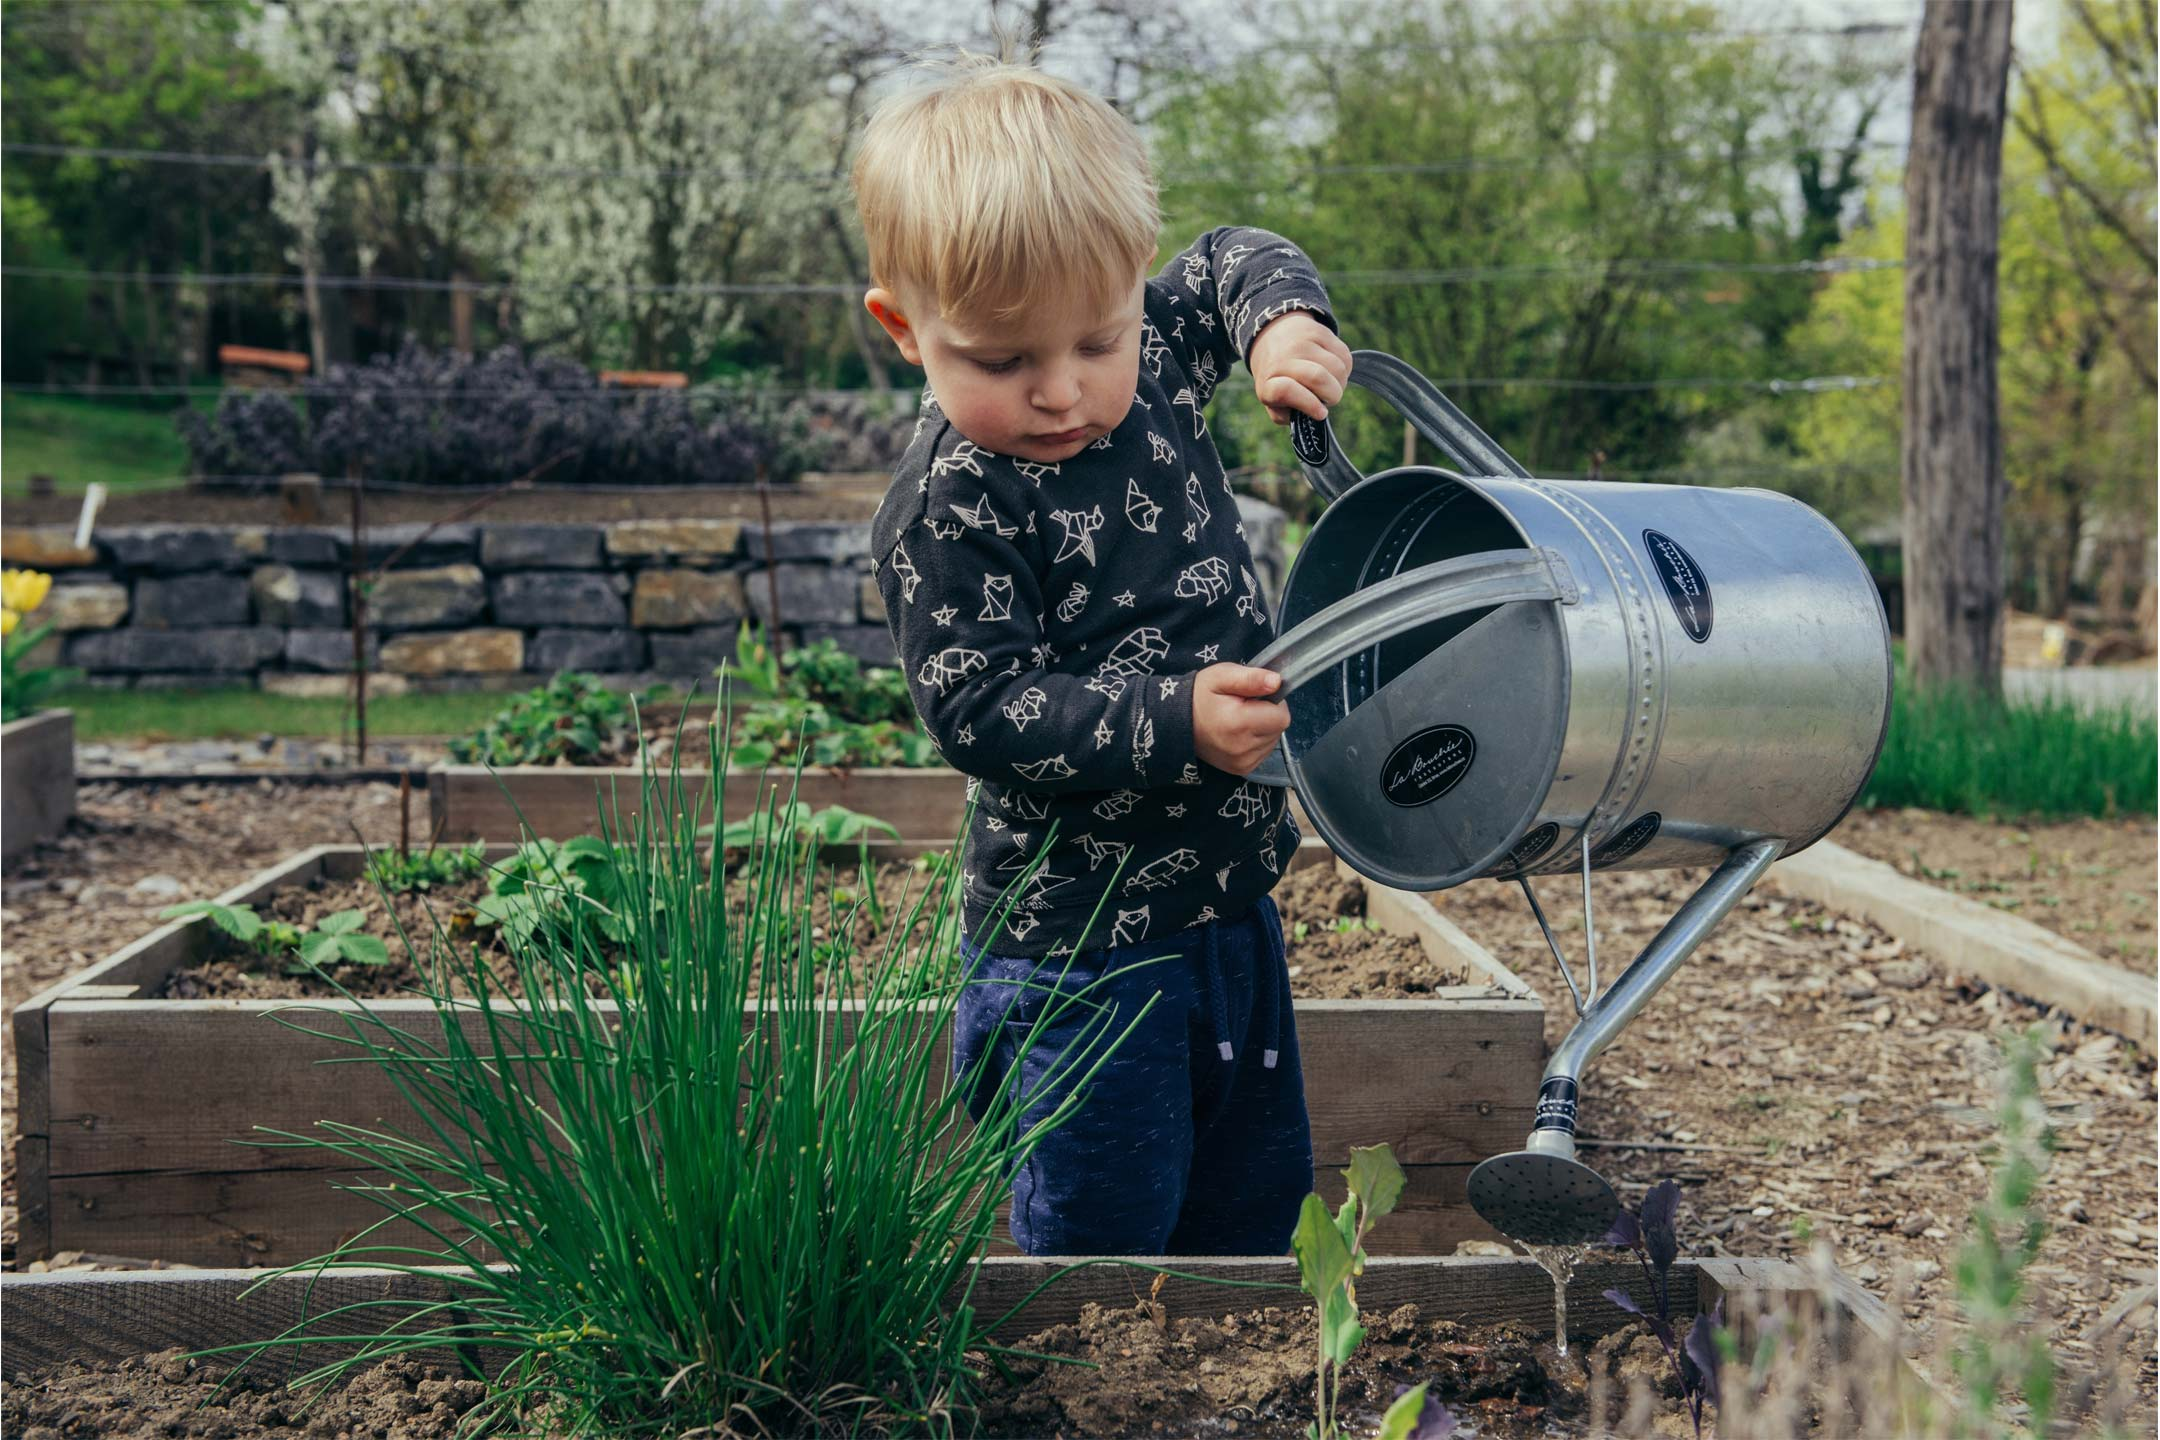 small-boy-watering-garden2160